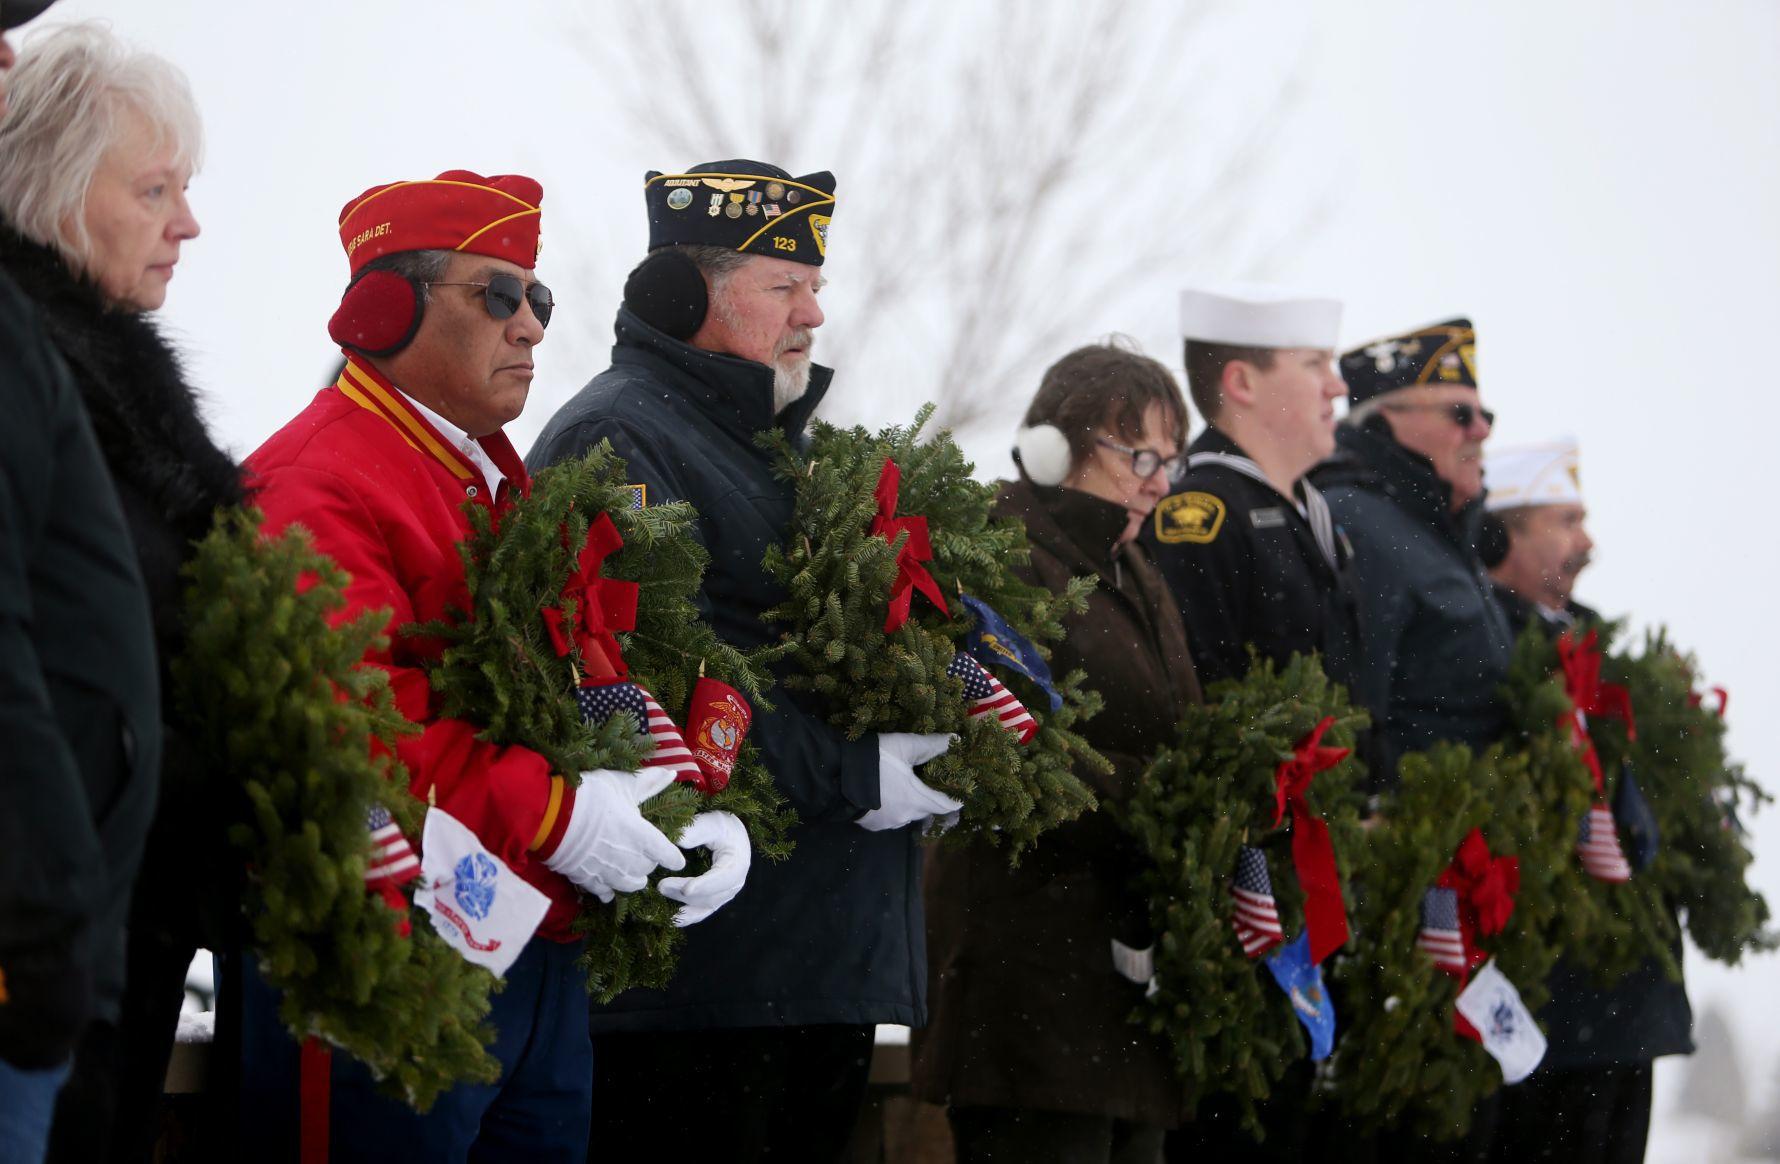 Yellowstone National Cemetery to host Wreaths Across America ceremony | Billings Gazette